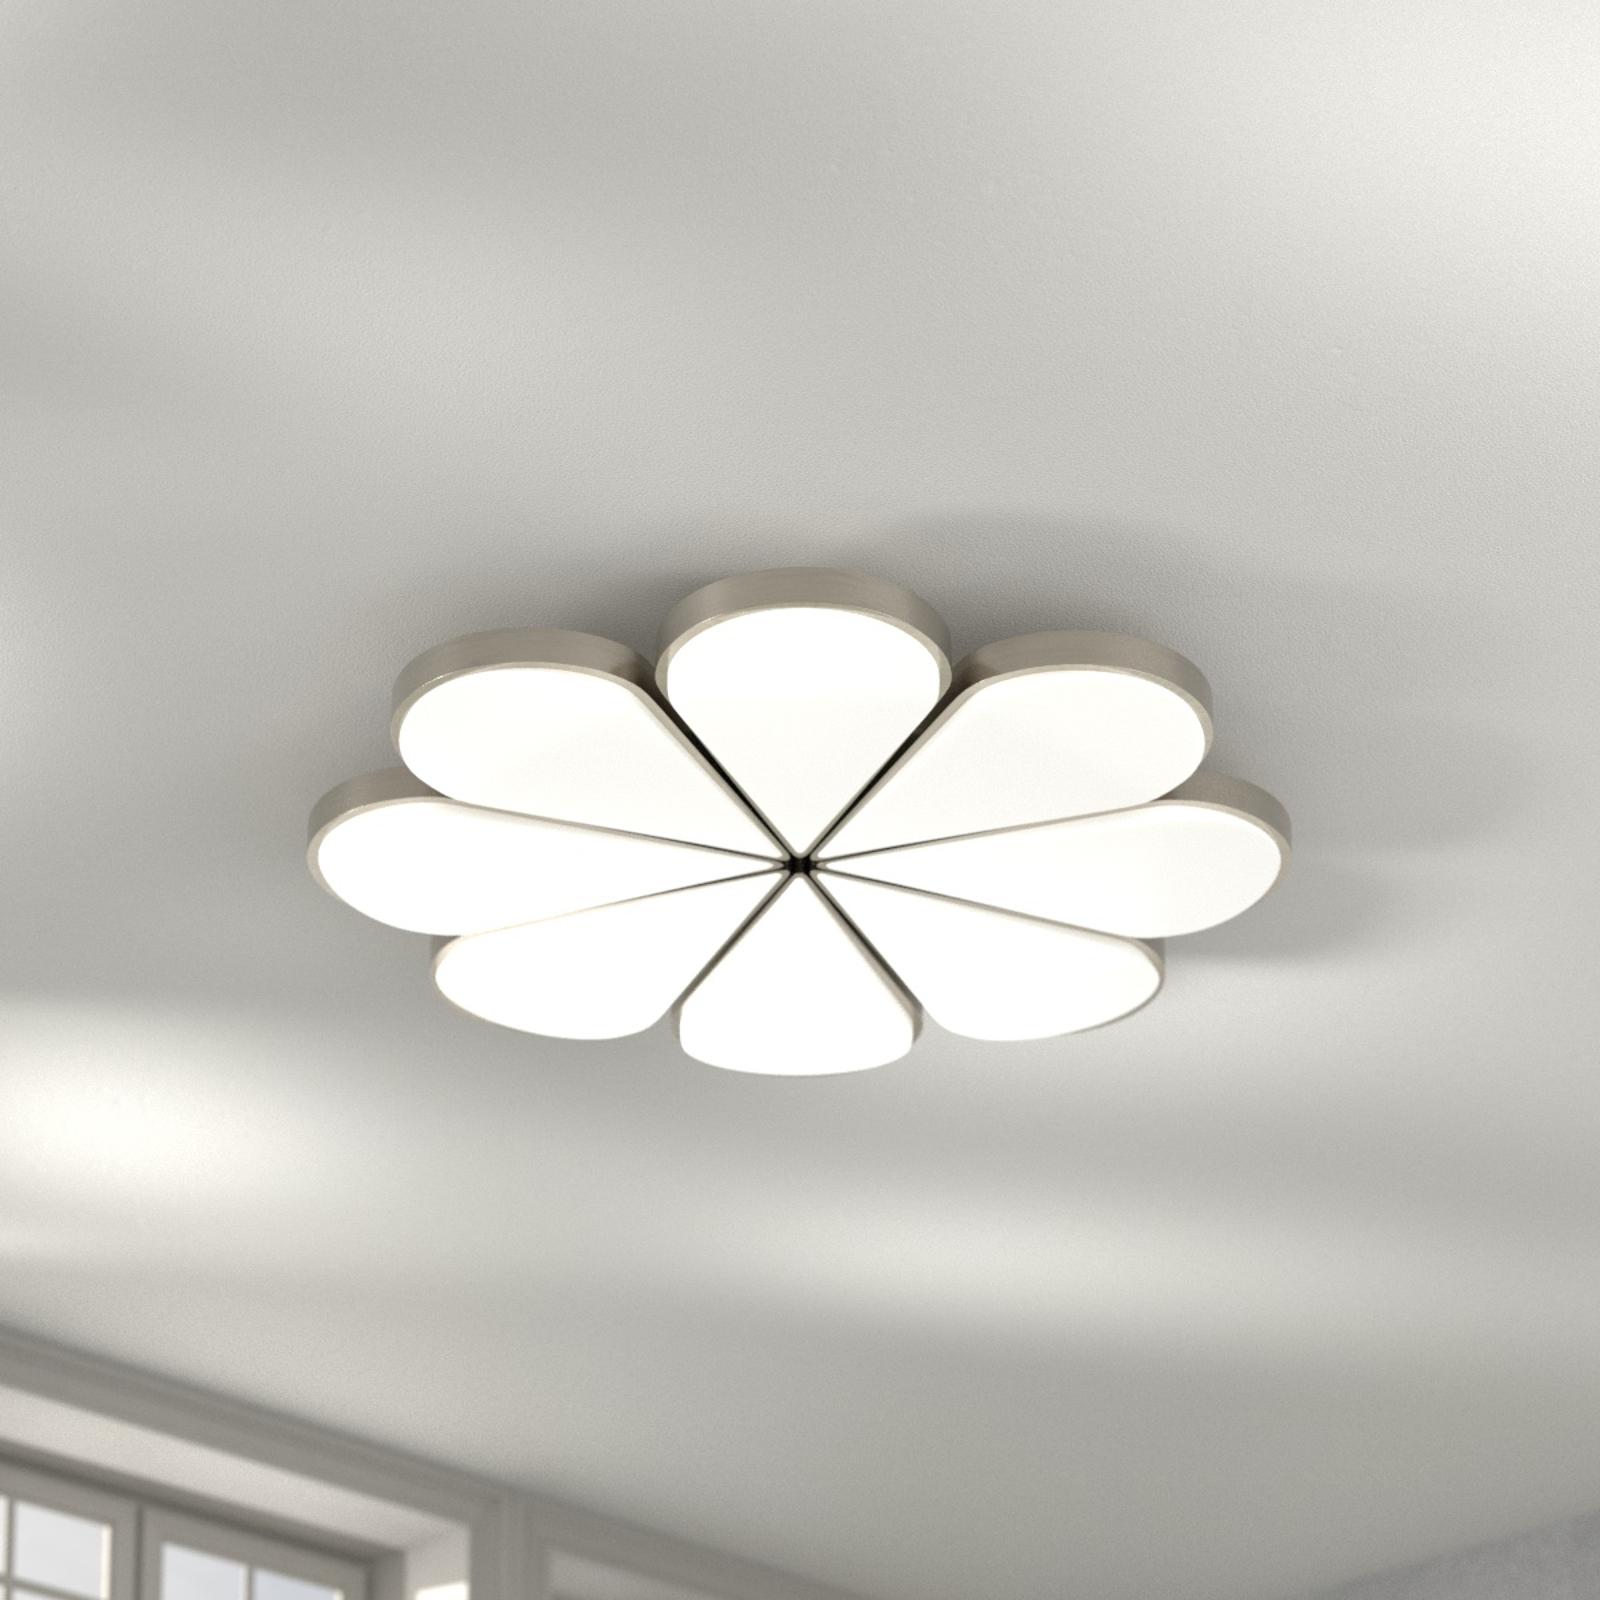 B-Leuchten Flower LED plafondlamp CCT Ø 61 cm